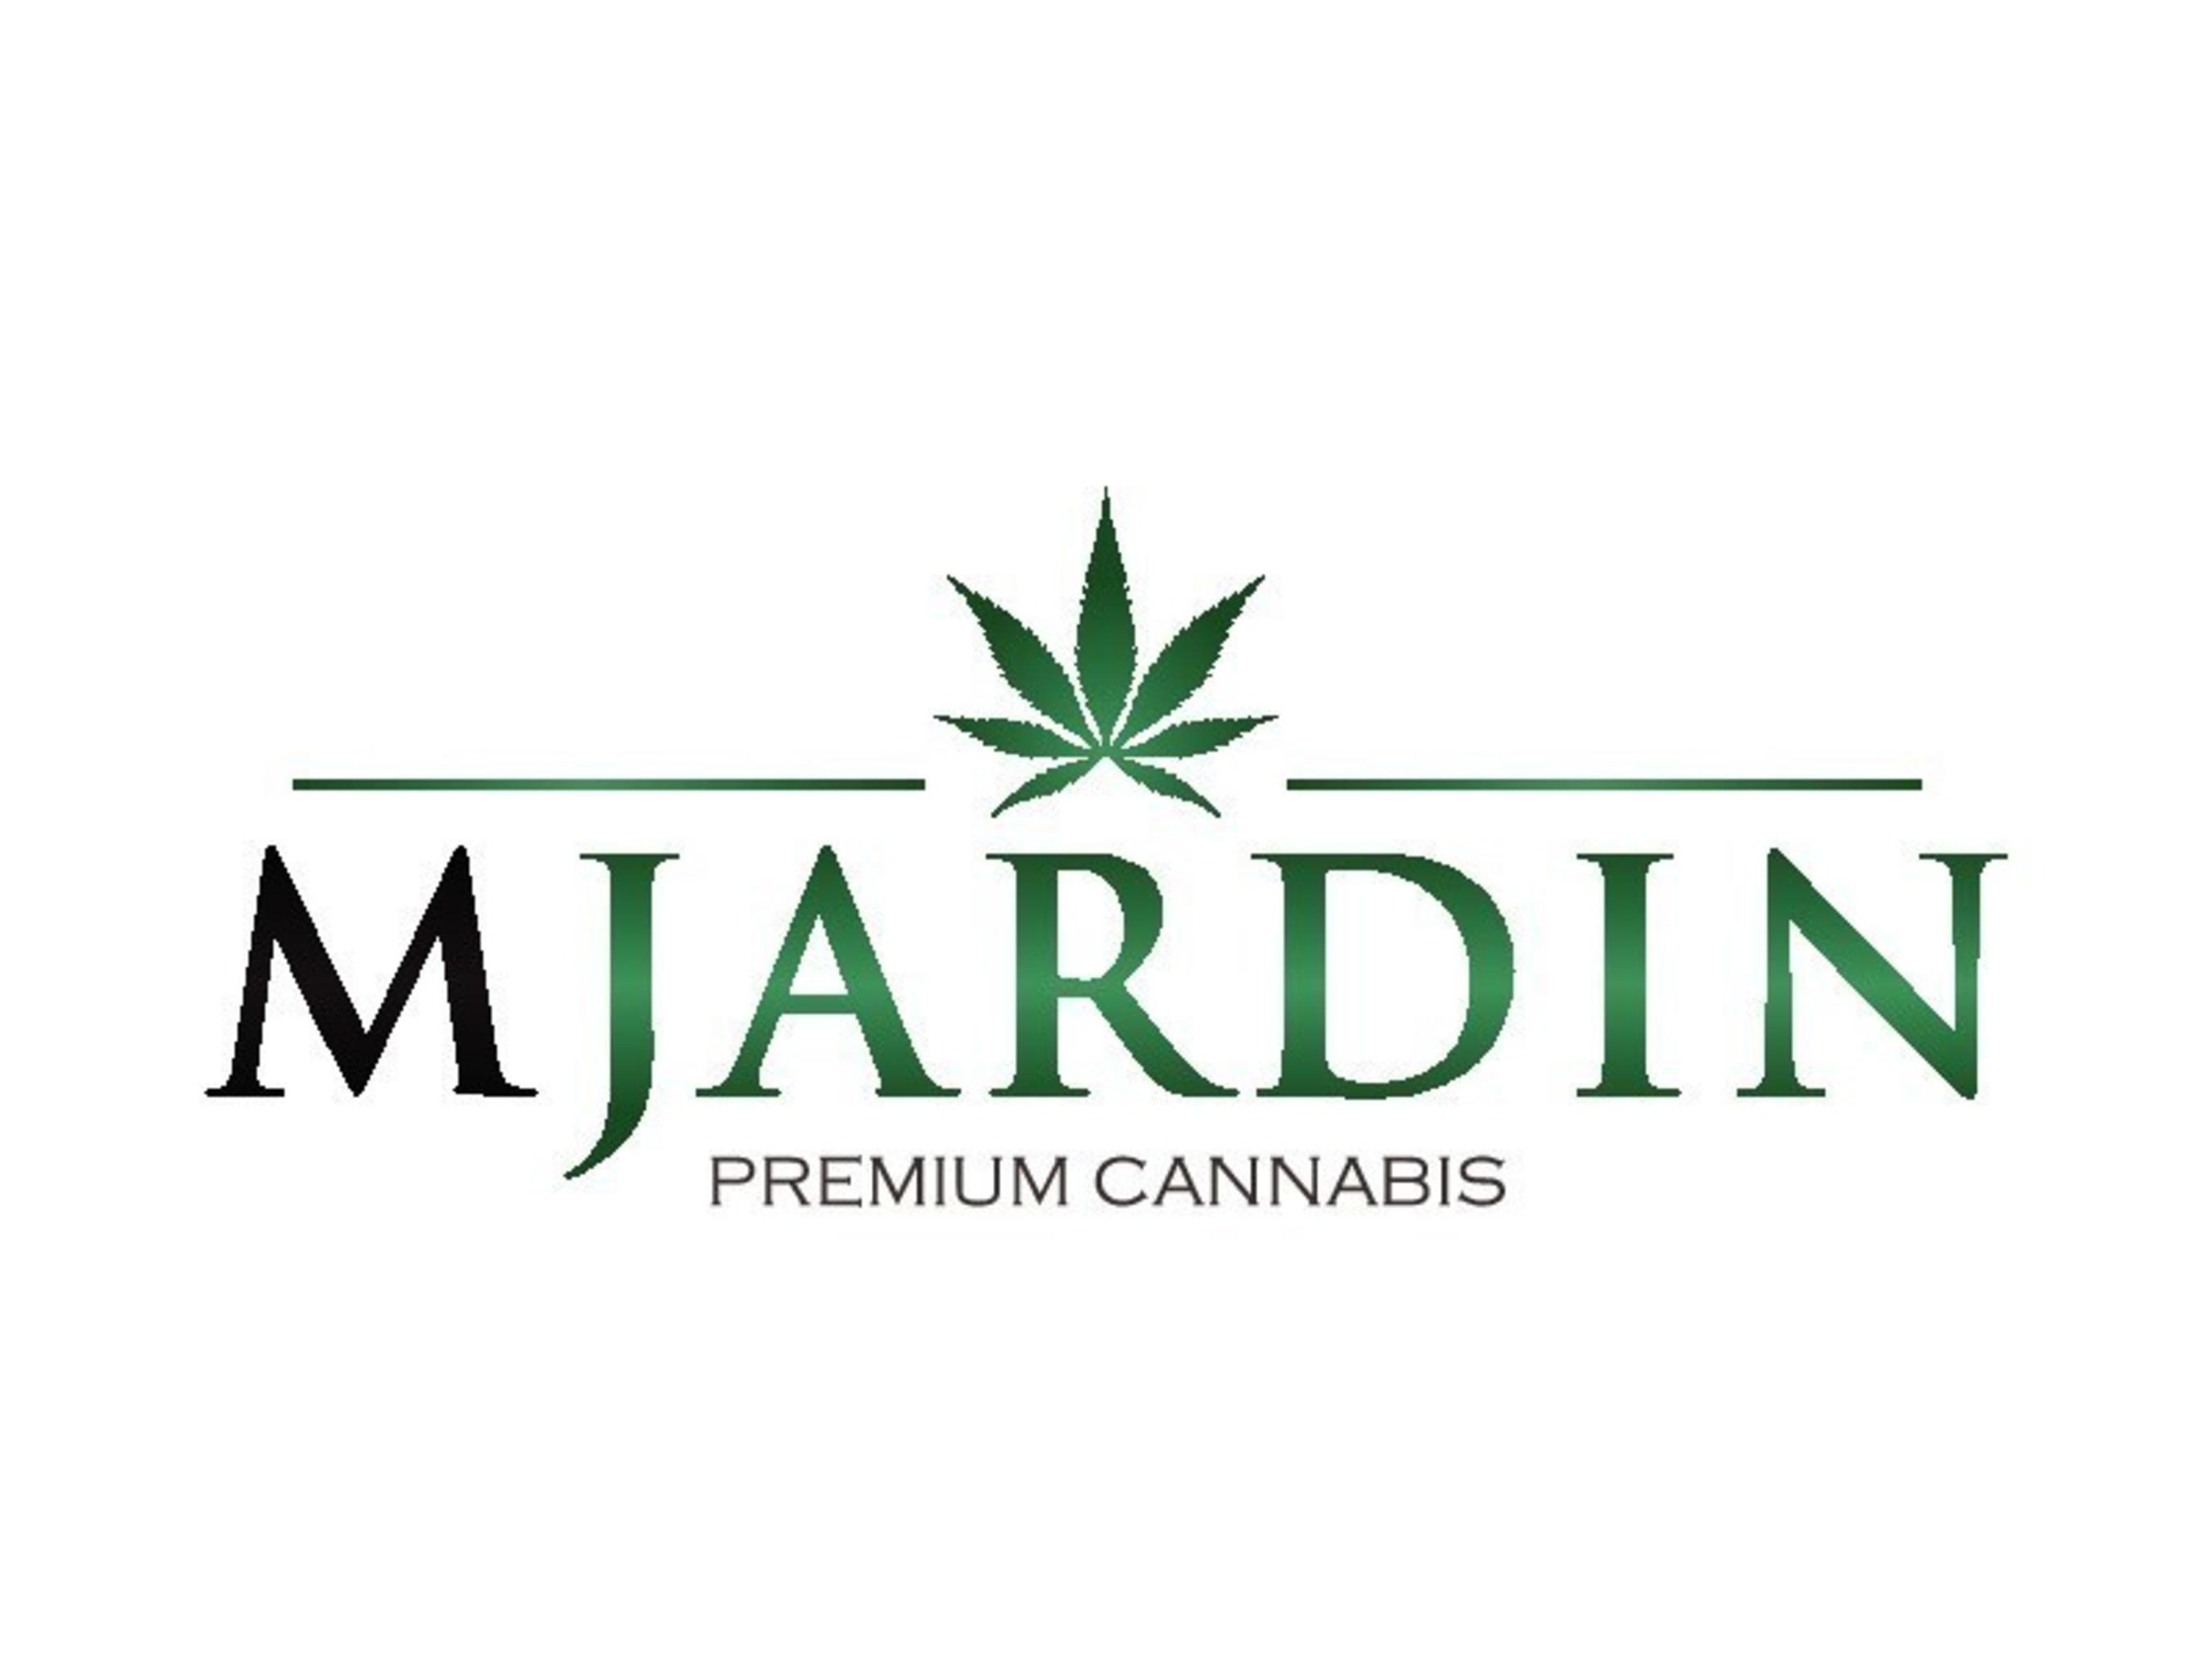 MJardin Premium Cannabis